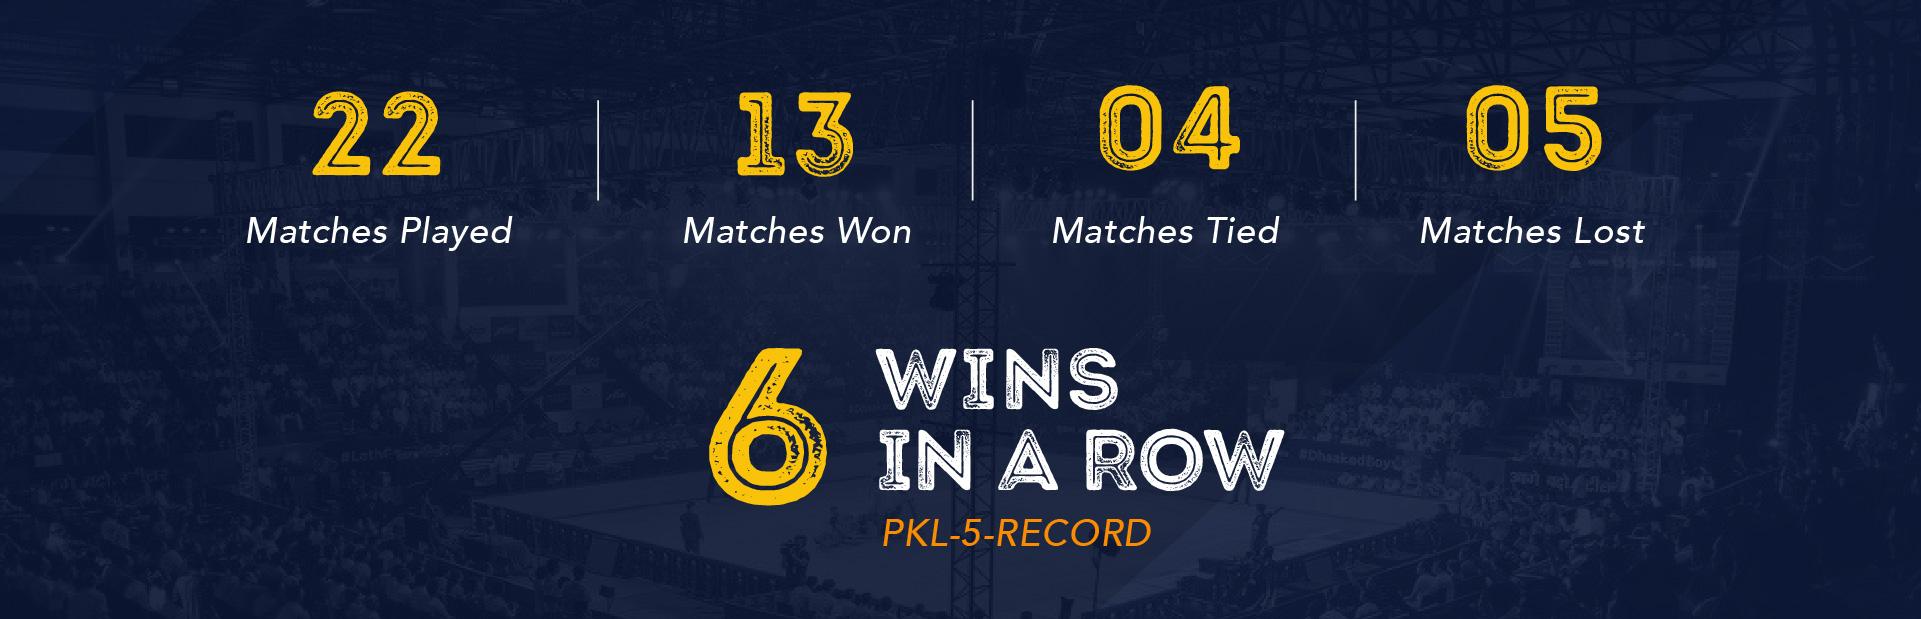 Haryana Steelers Wins